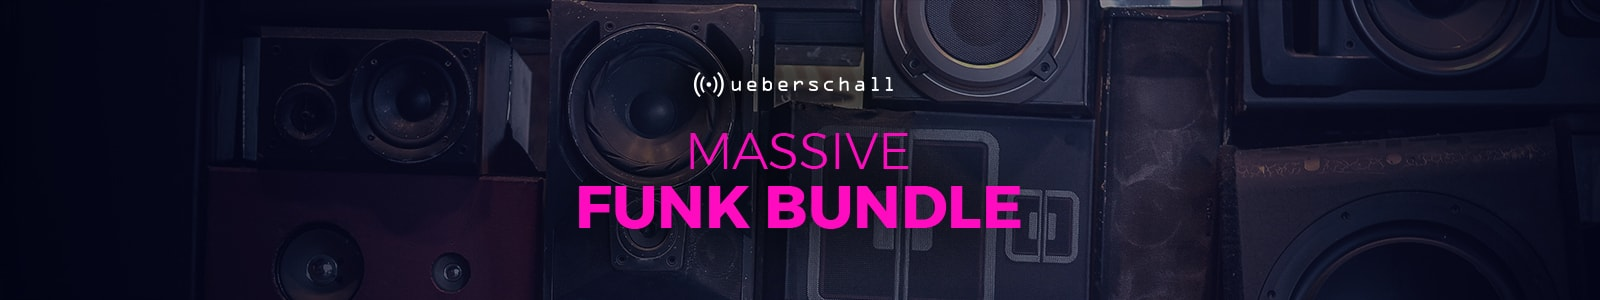 funk bundle